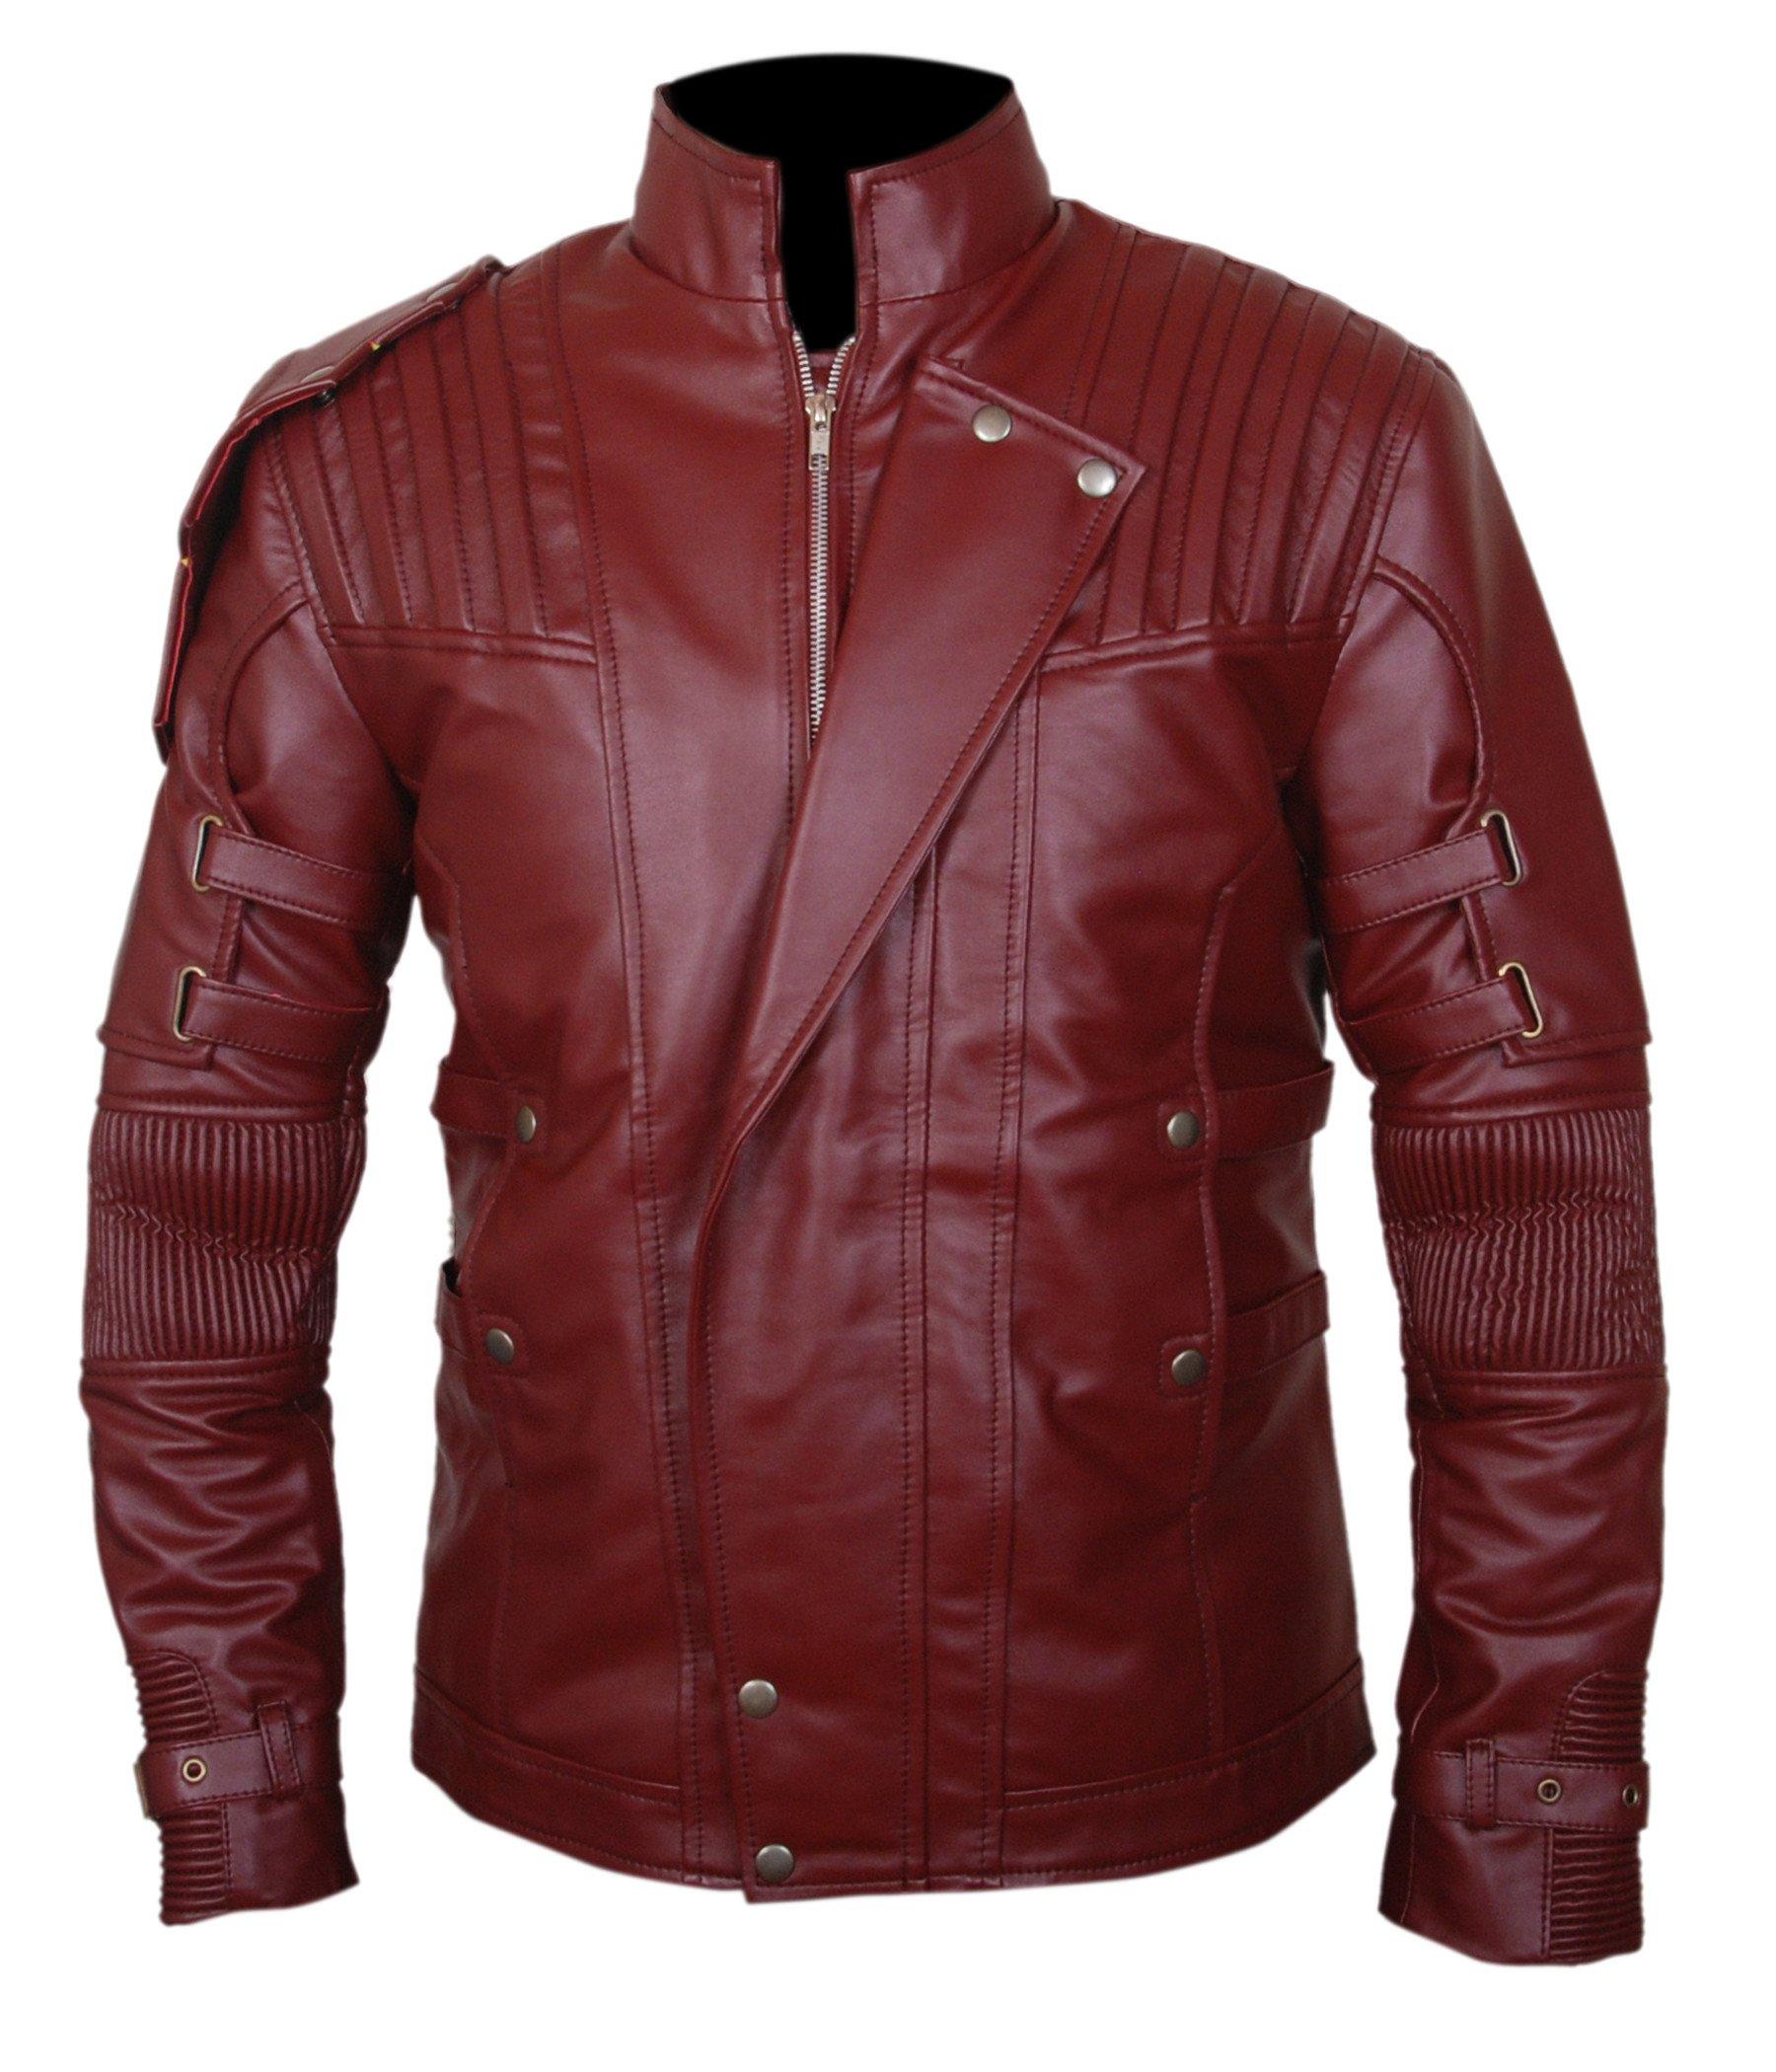 F&H Boy's Guardians Of The Galaxy Vol 2 Chris Pratt Star Lord Genuine Leather Jacket L Maroon by Flesh & Hide